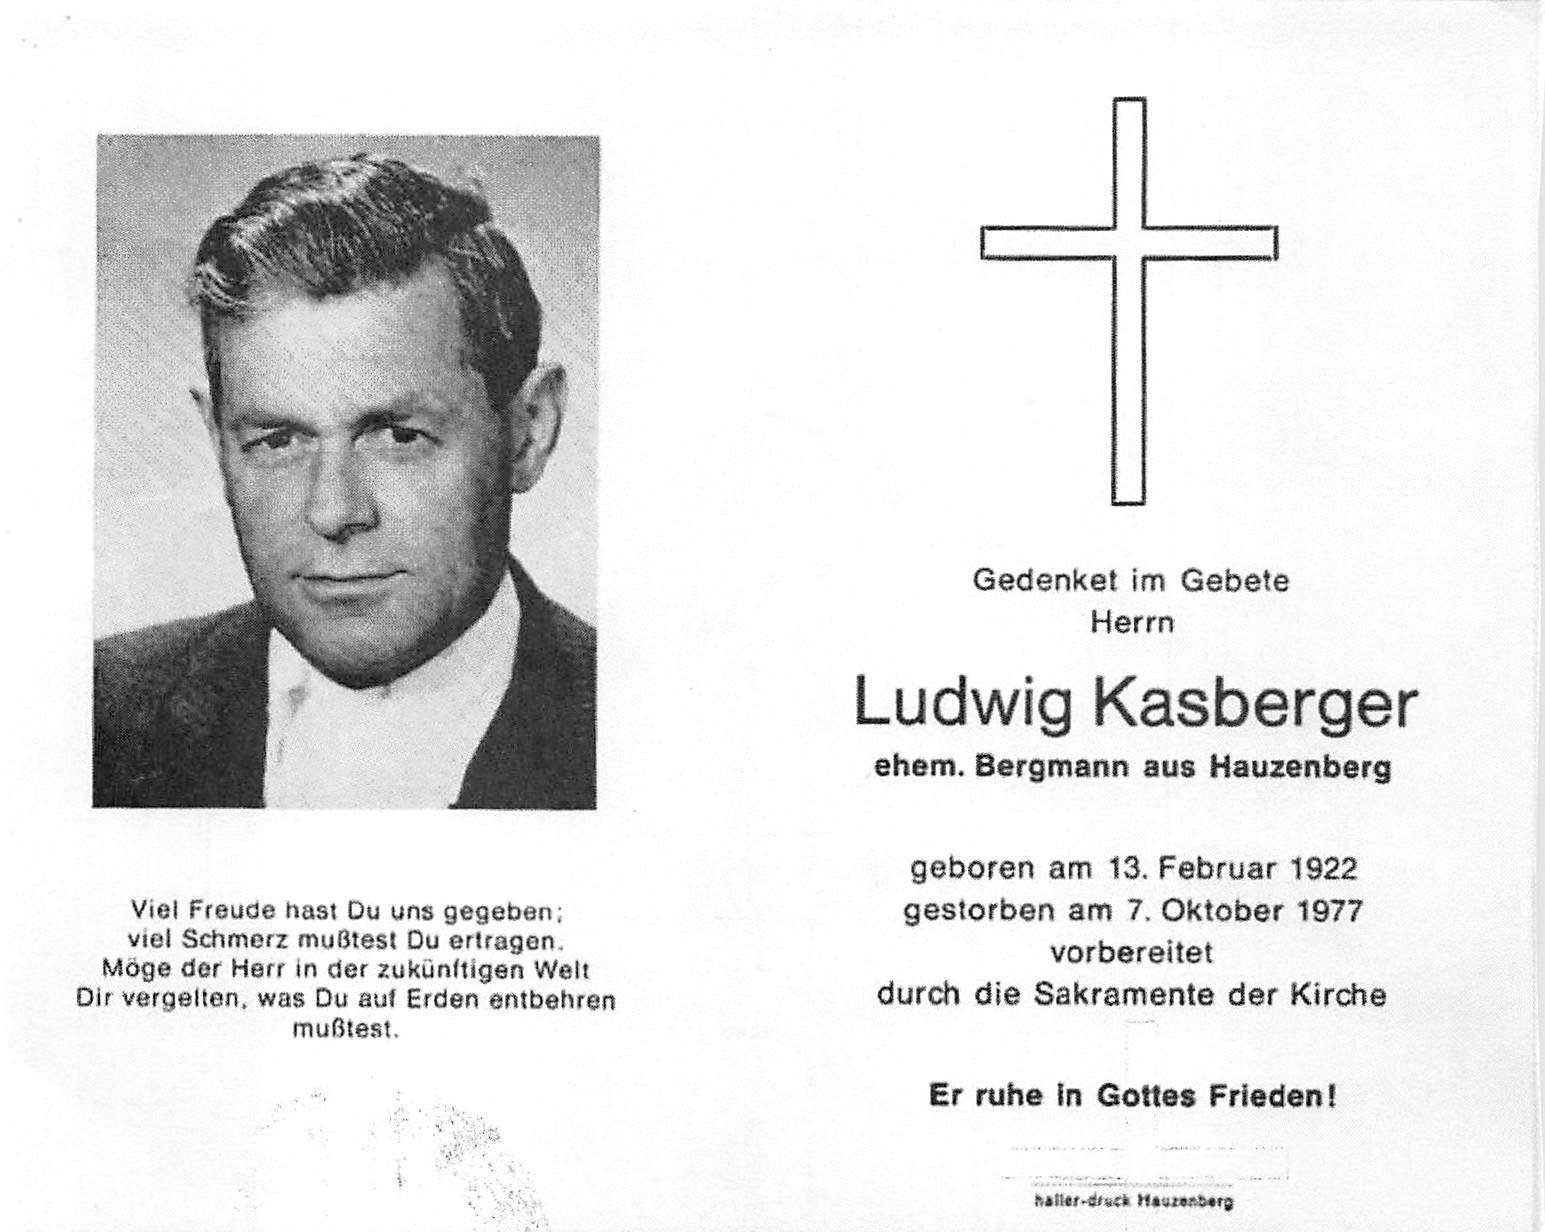 1977-10-07-Kasberger-Ludwig-Hauzenberg-ehem.-Bergmann